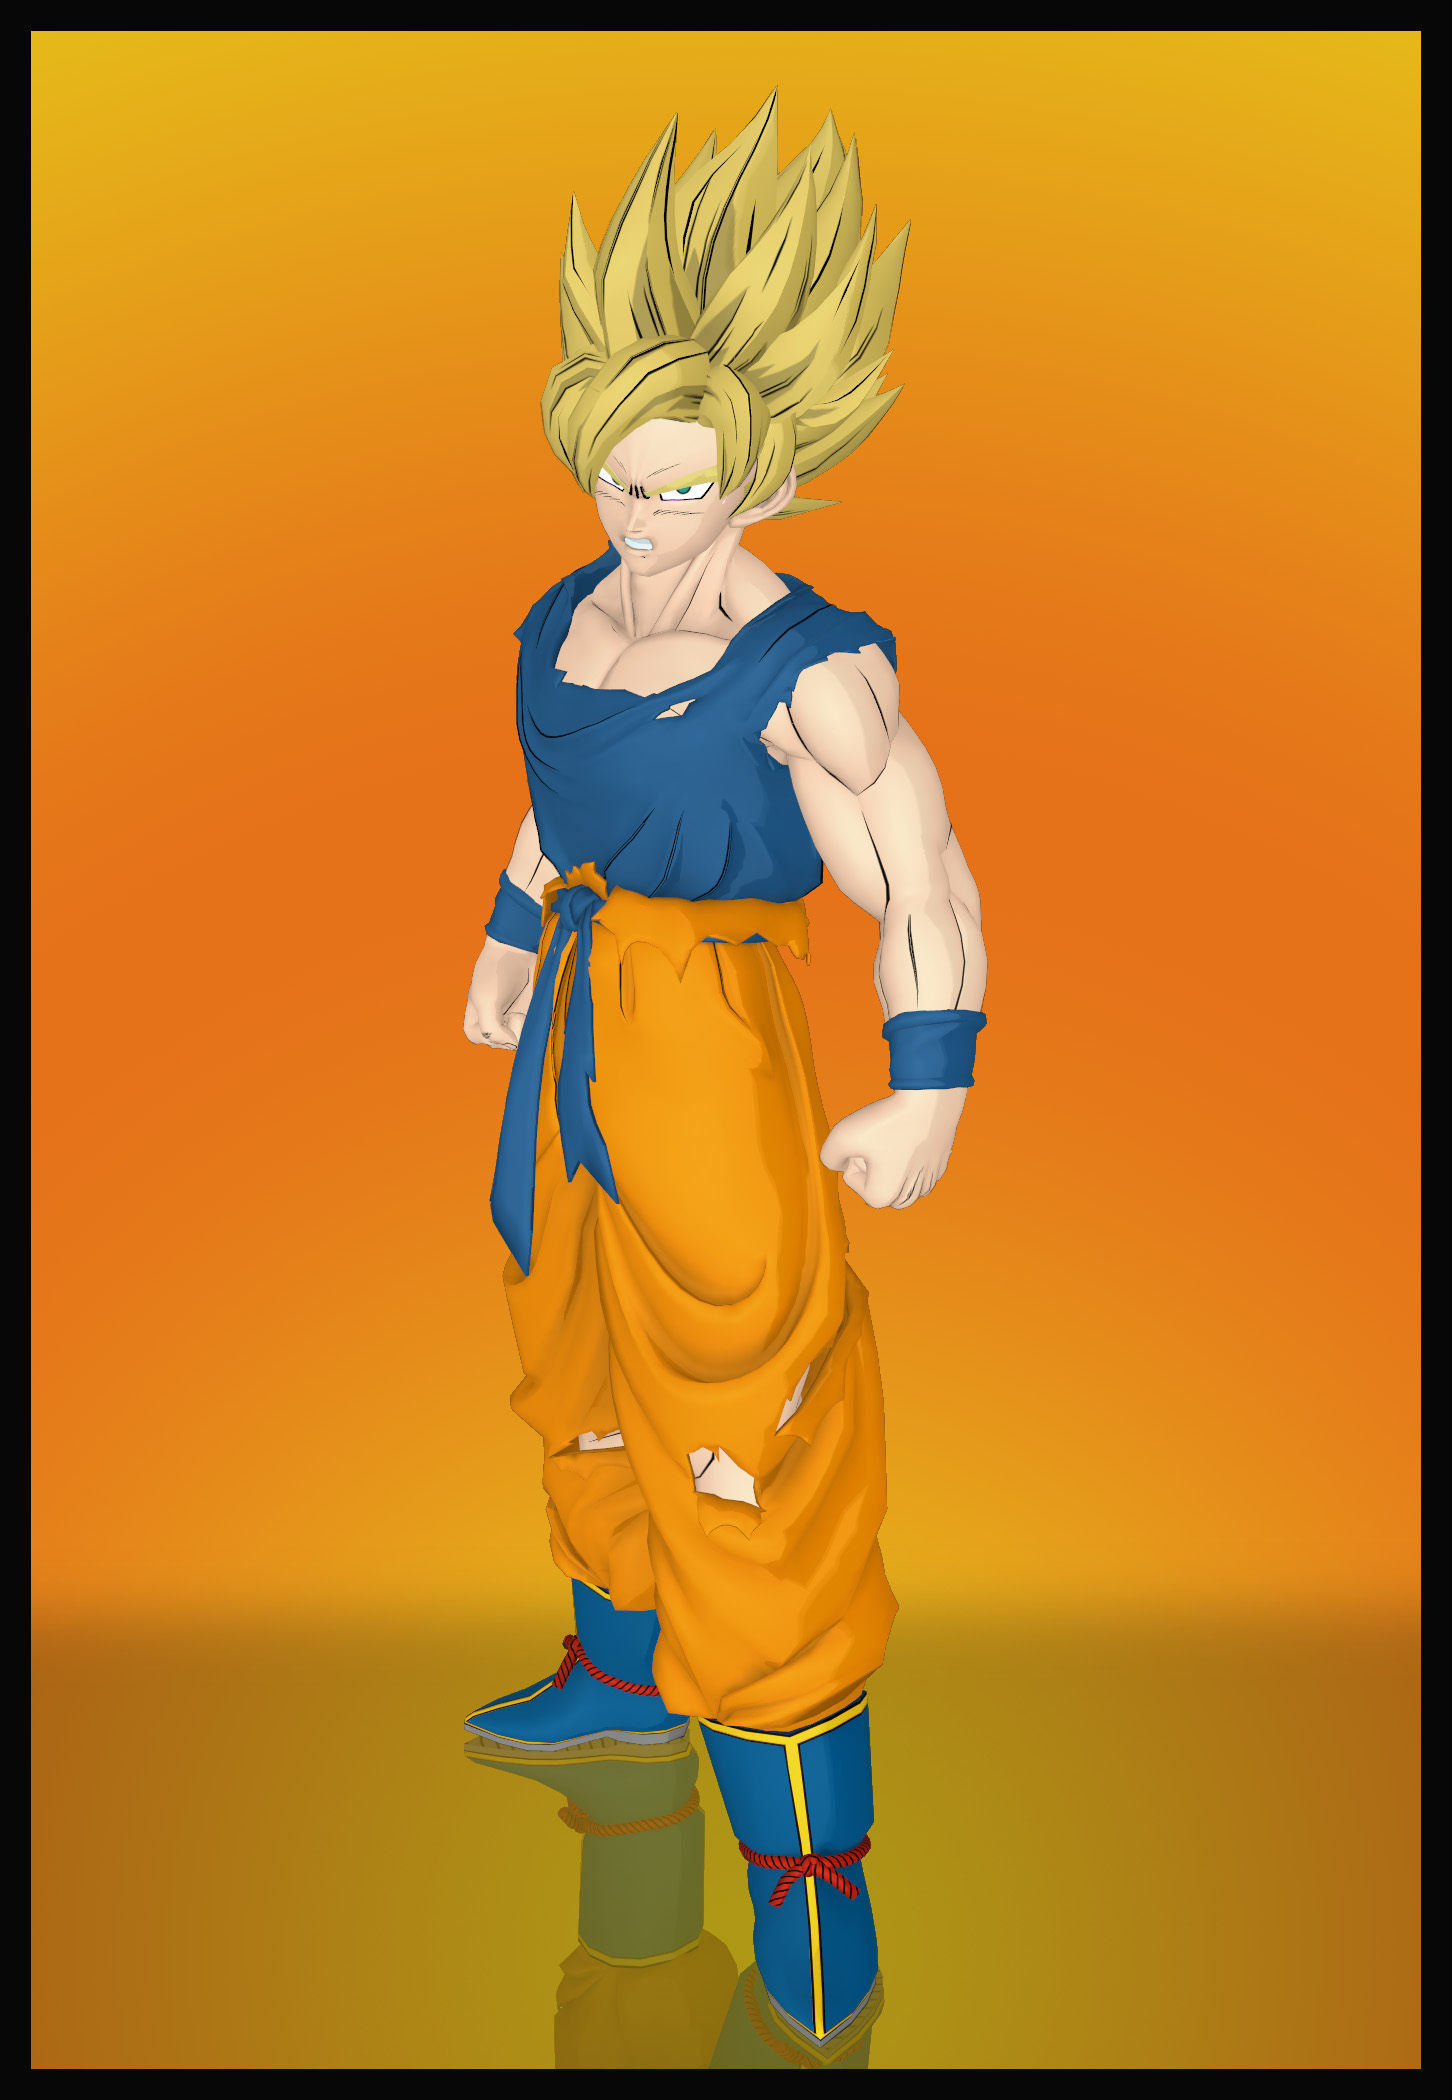 Dragon Ball Z Kakarot Son Goku Ssj1 Suit 01 By Mrunclebingo On Deviantart